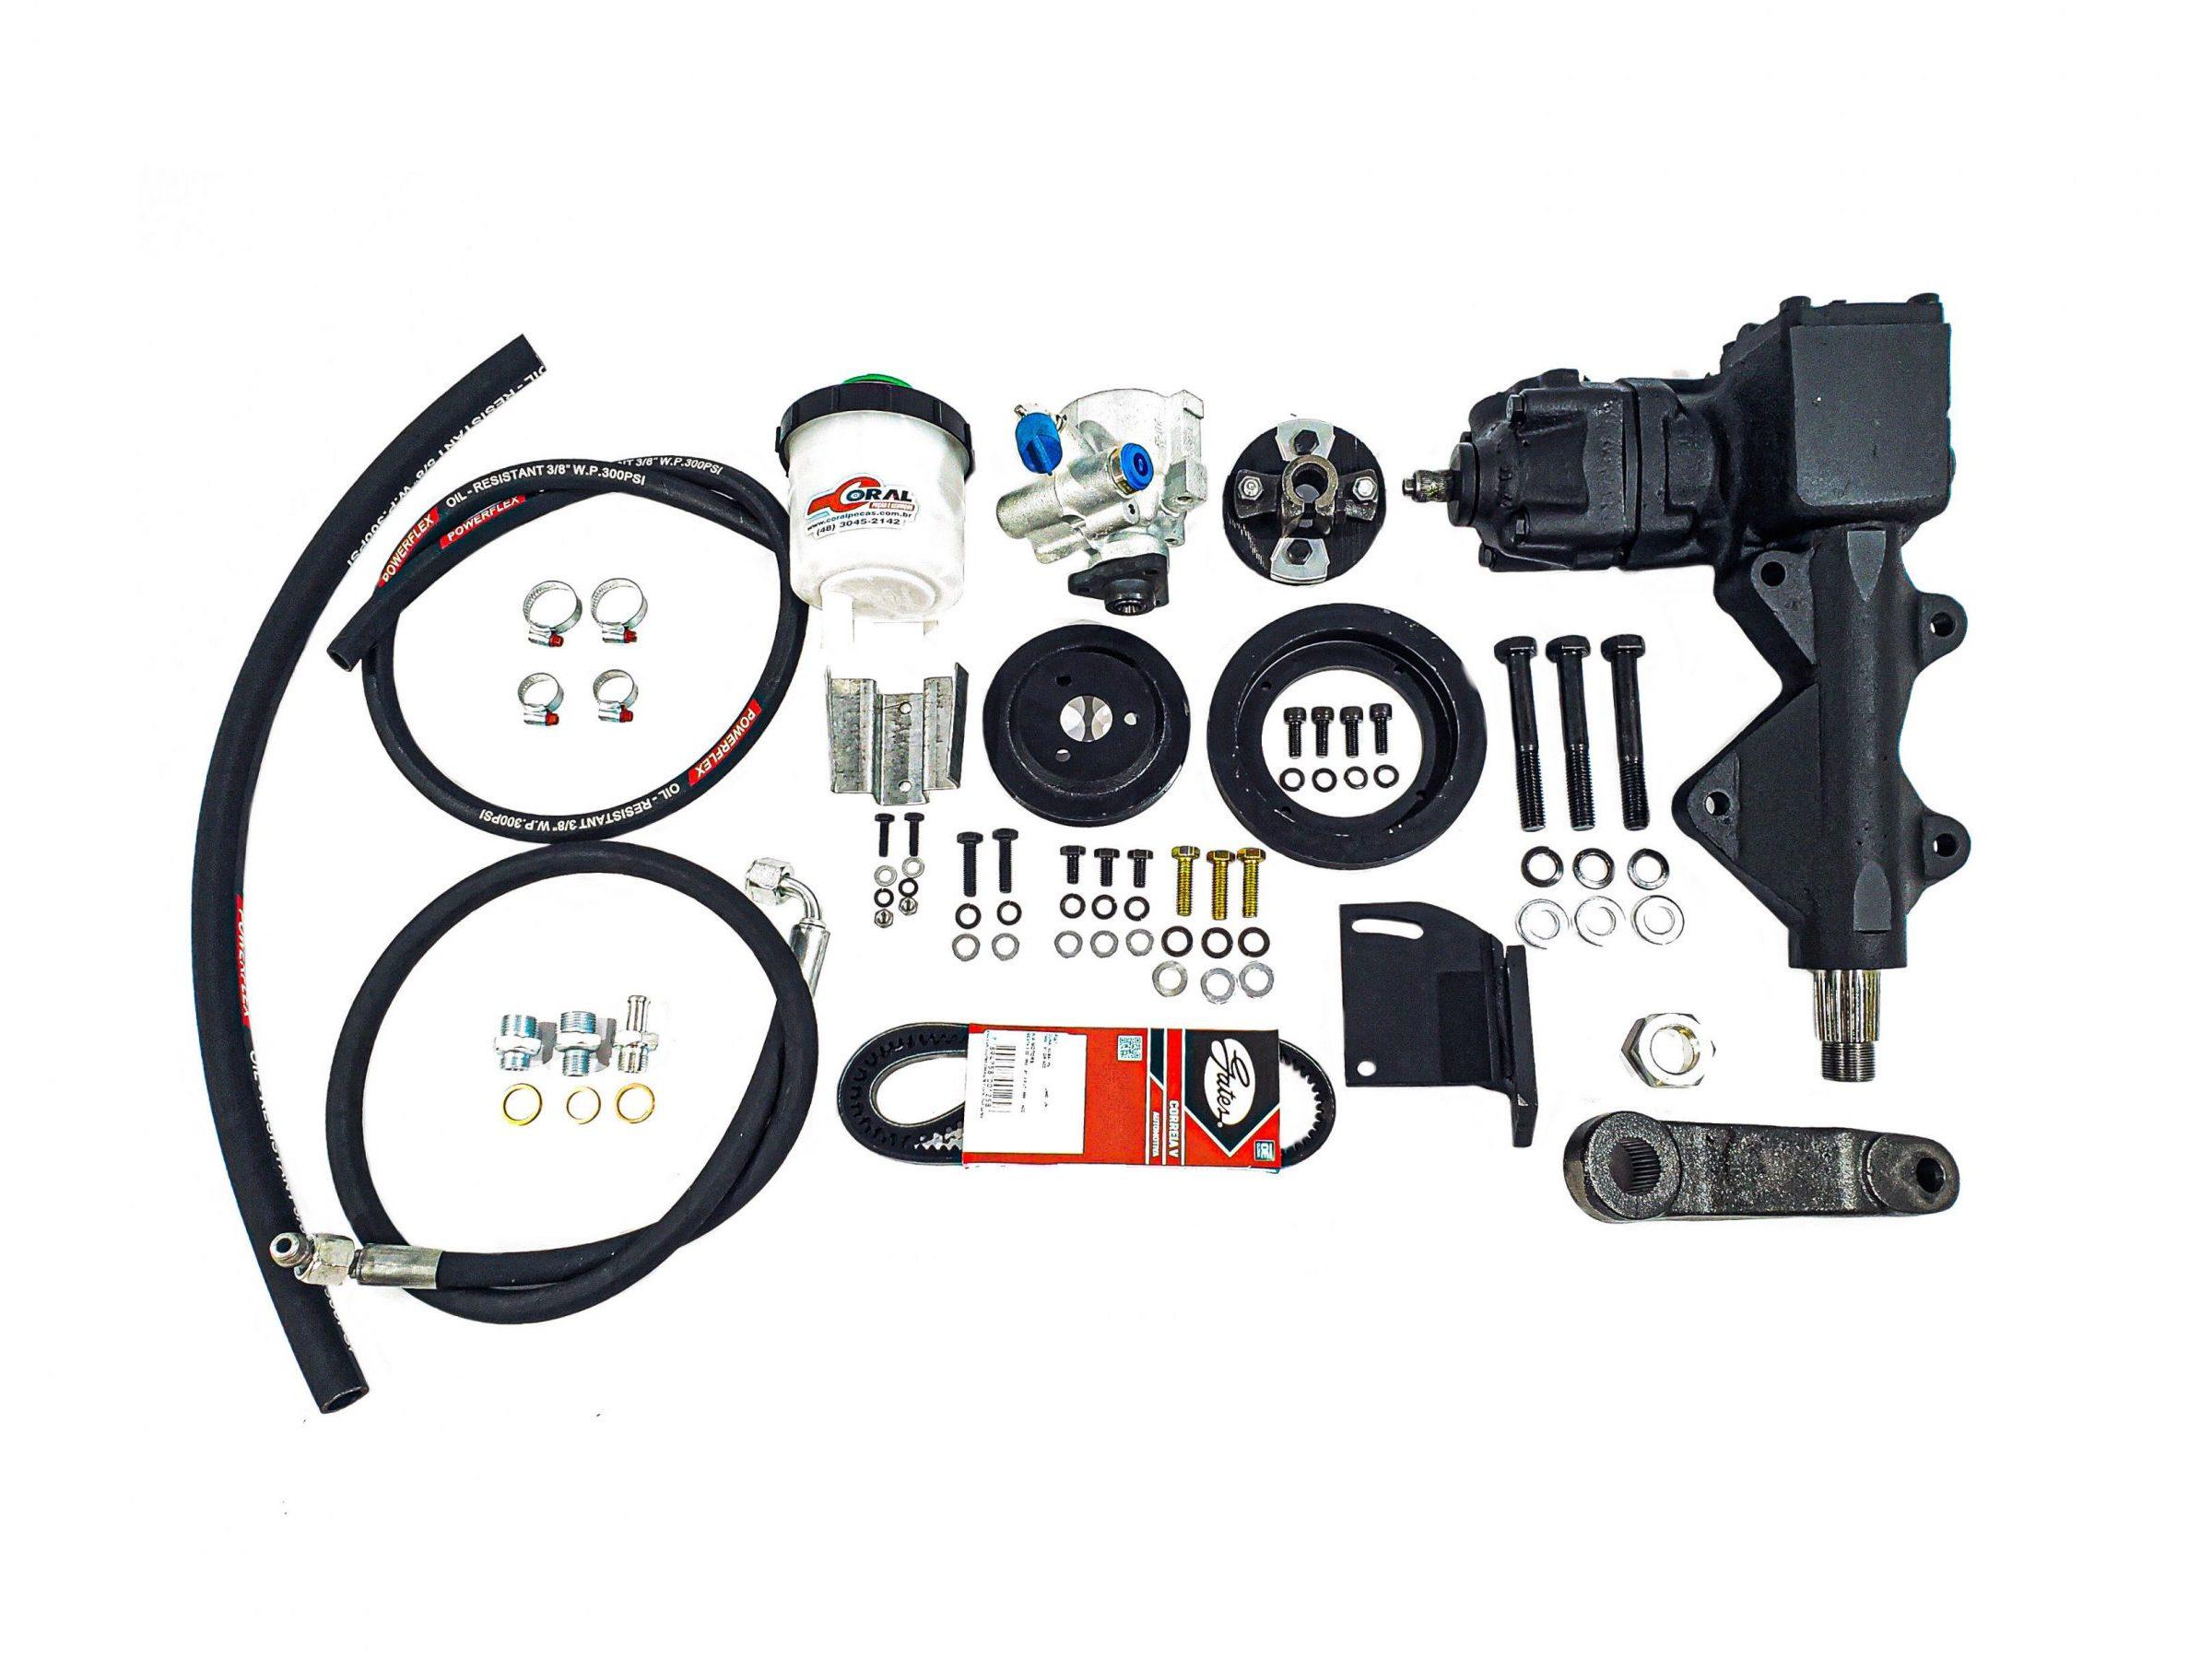 Kit Direção Hidráulica Ford F100/F1000 4 CC Gasolina (2.3 OHC)/ Álcool